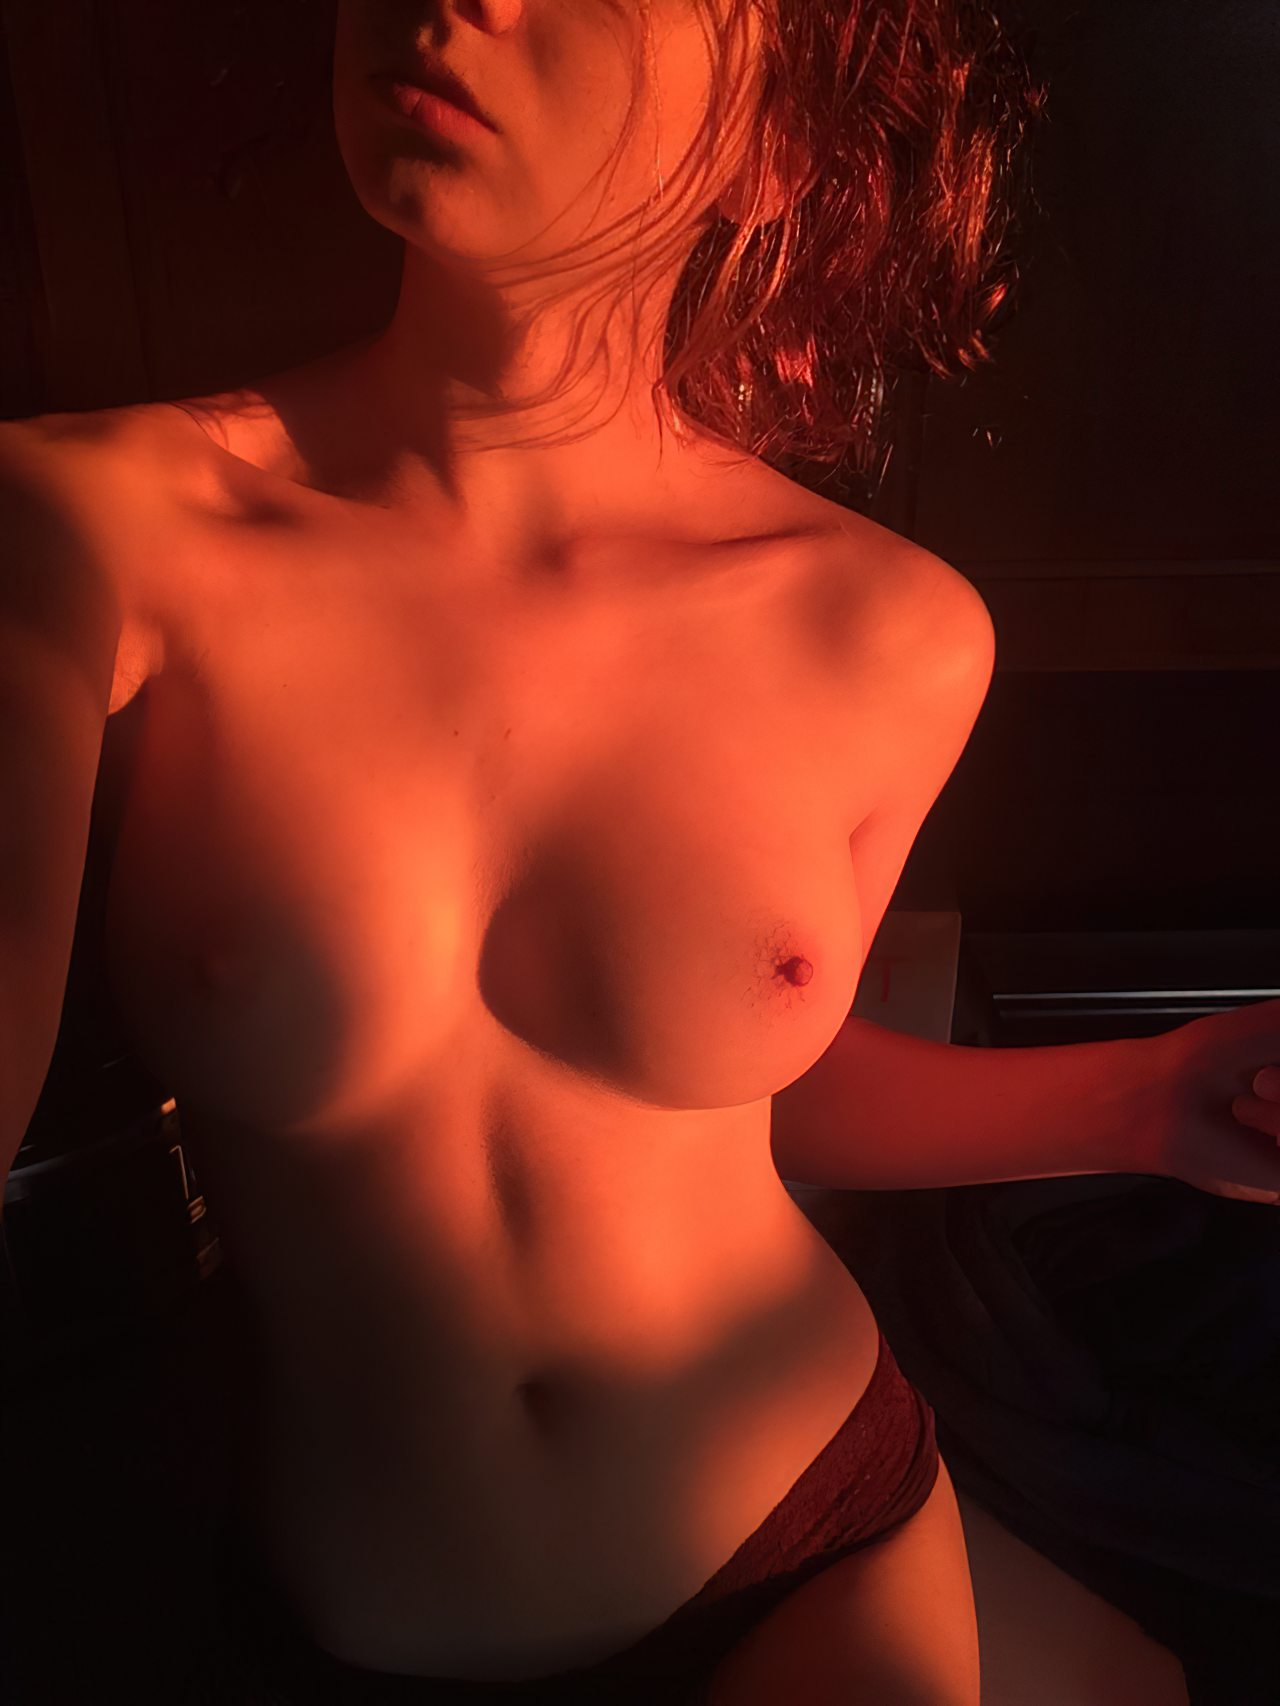 Fotos Mulheres Despidas (42)